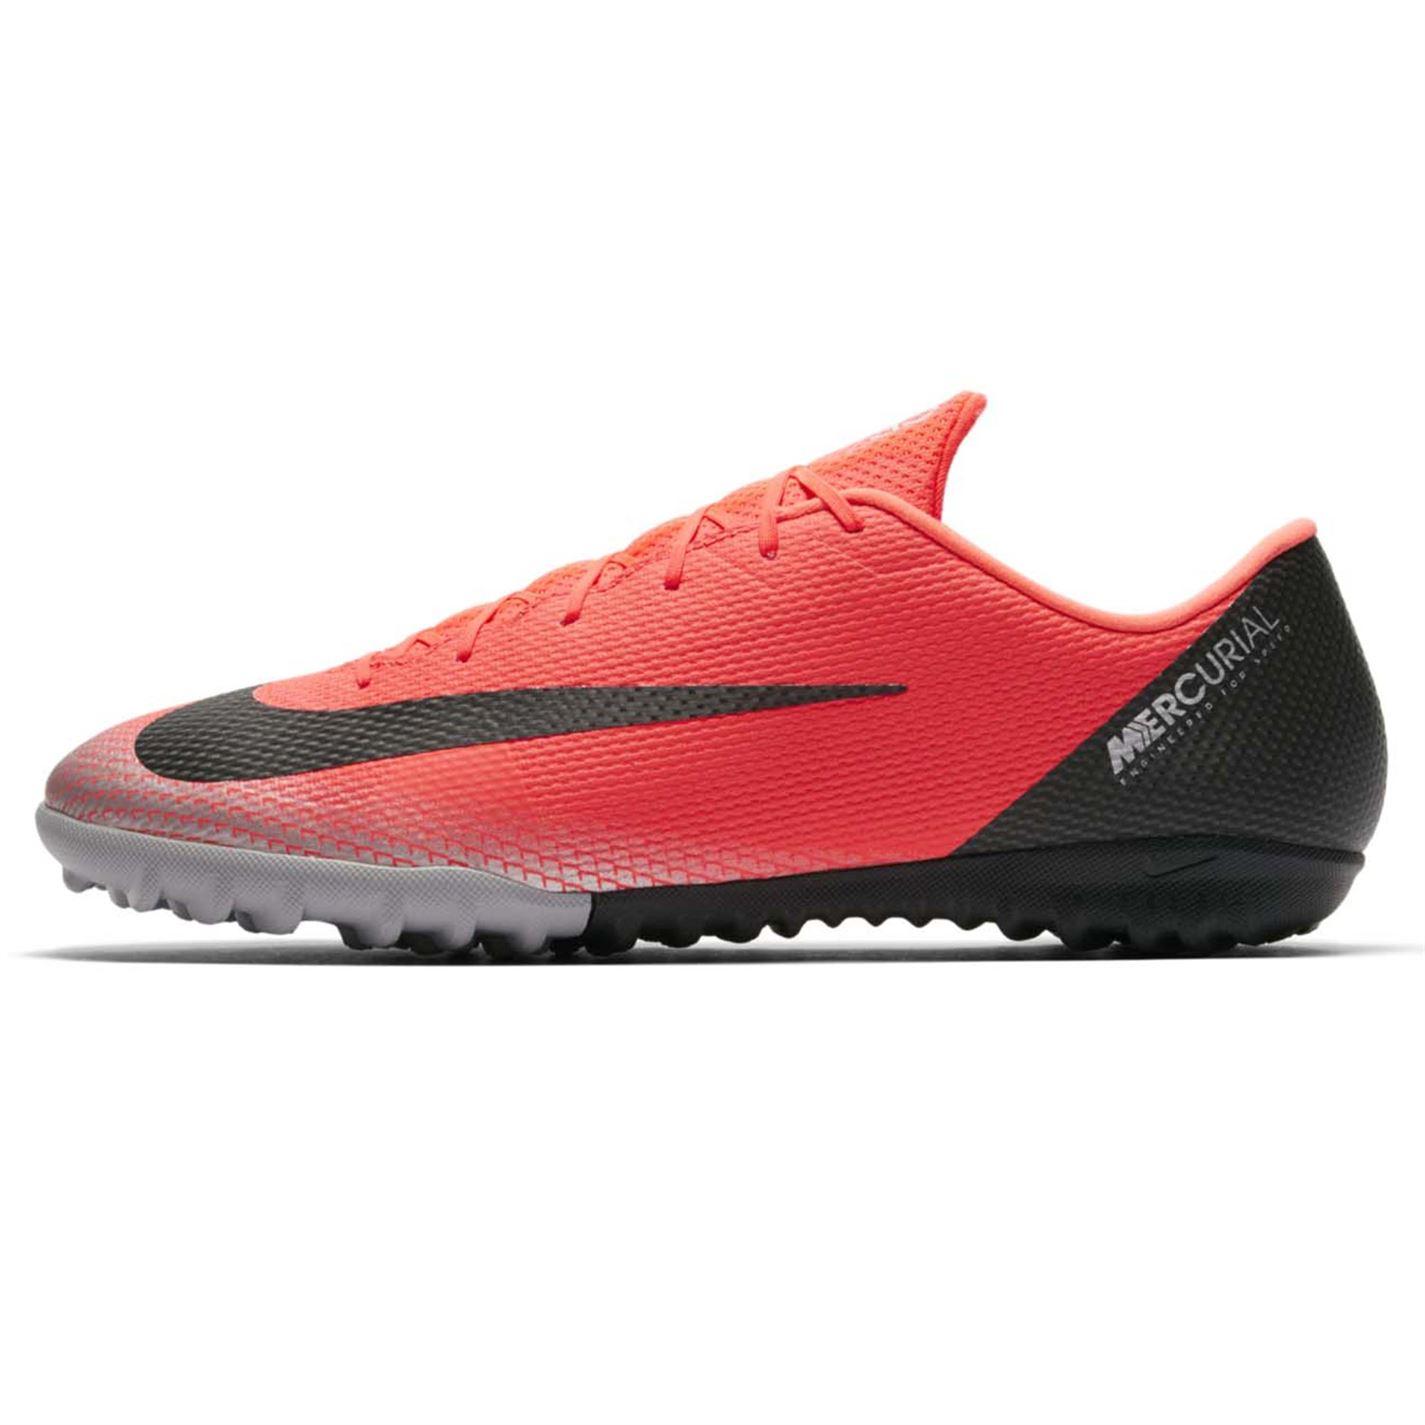 Nike Mercurial Vapor Academy CR7 Mens Astro Turf Trainers